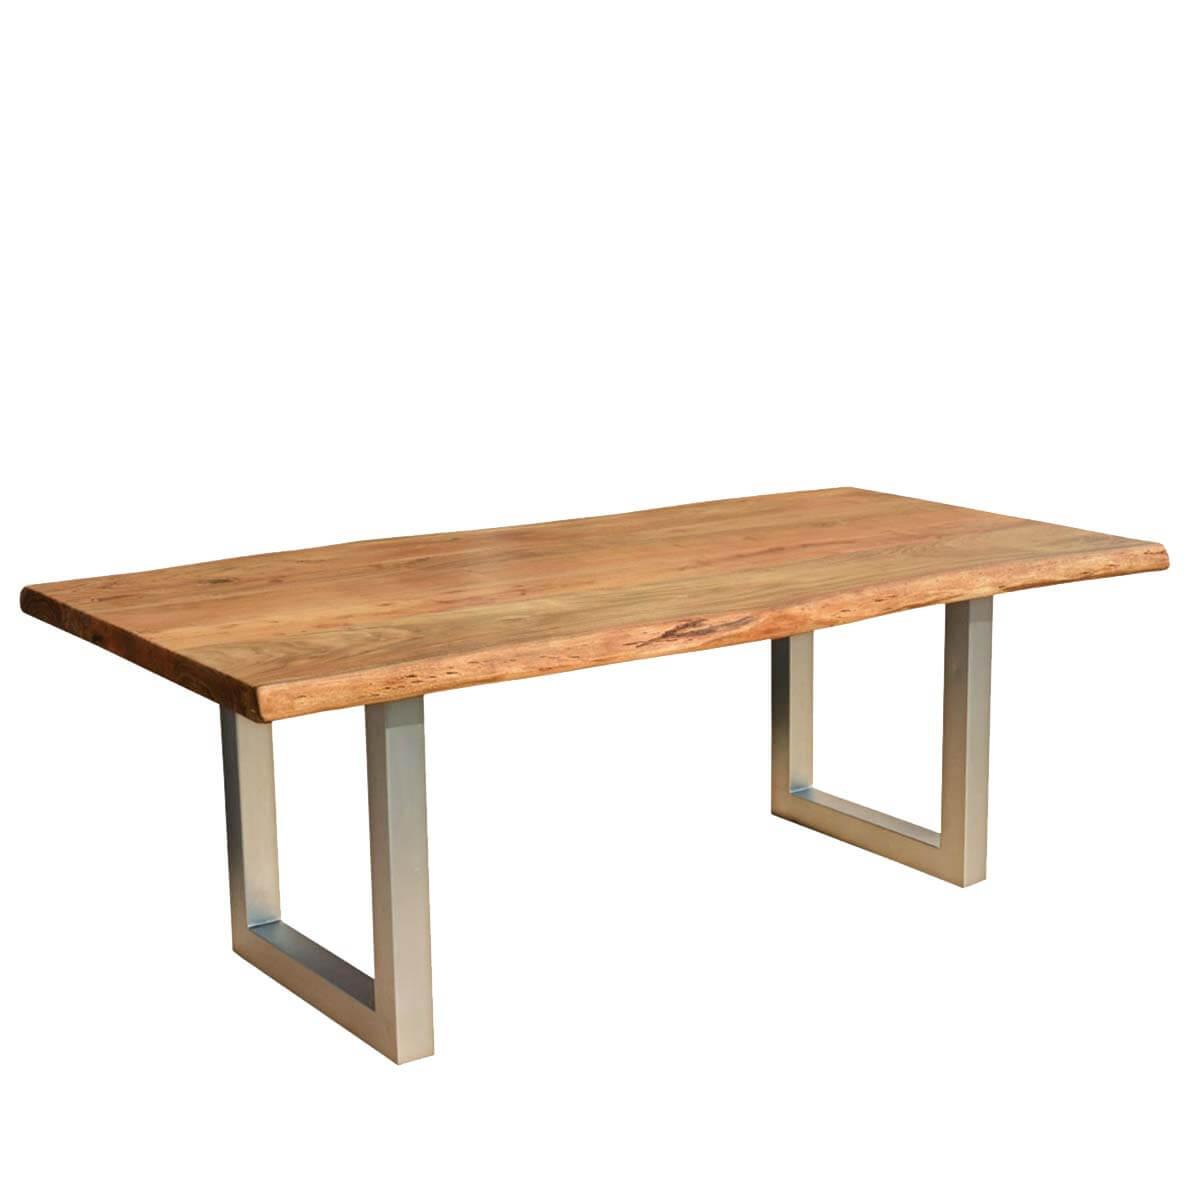 Hankin Wood & Iron Base Live Edge Dining Table